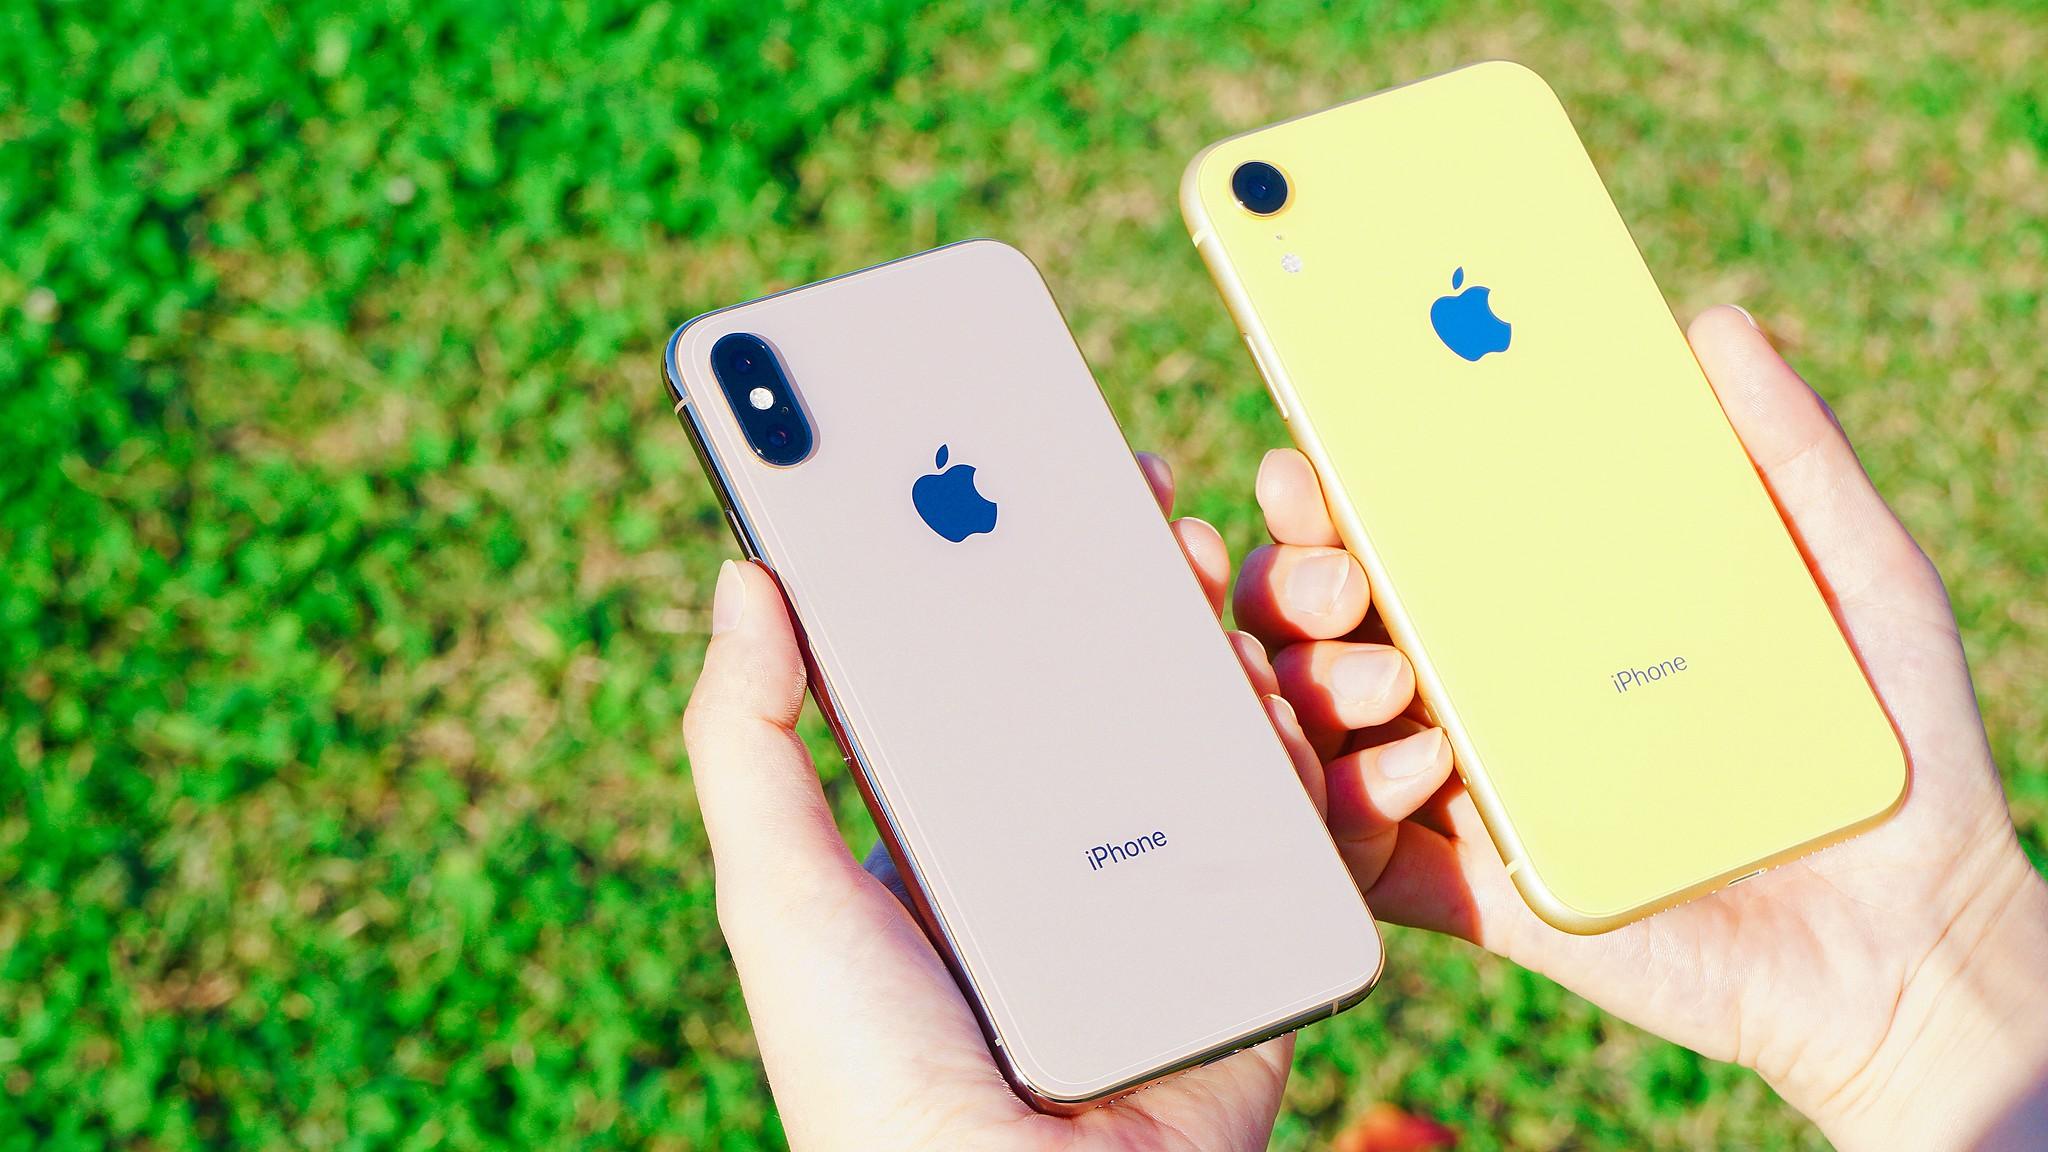 iPhone 11の噂まとめ 発売日・発表日・価格・スペックなど